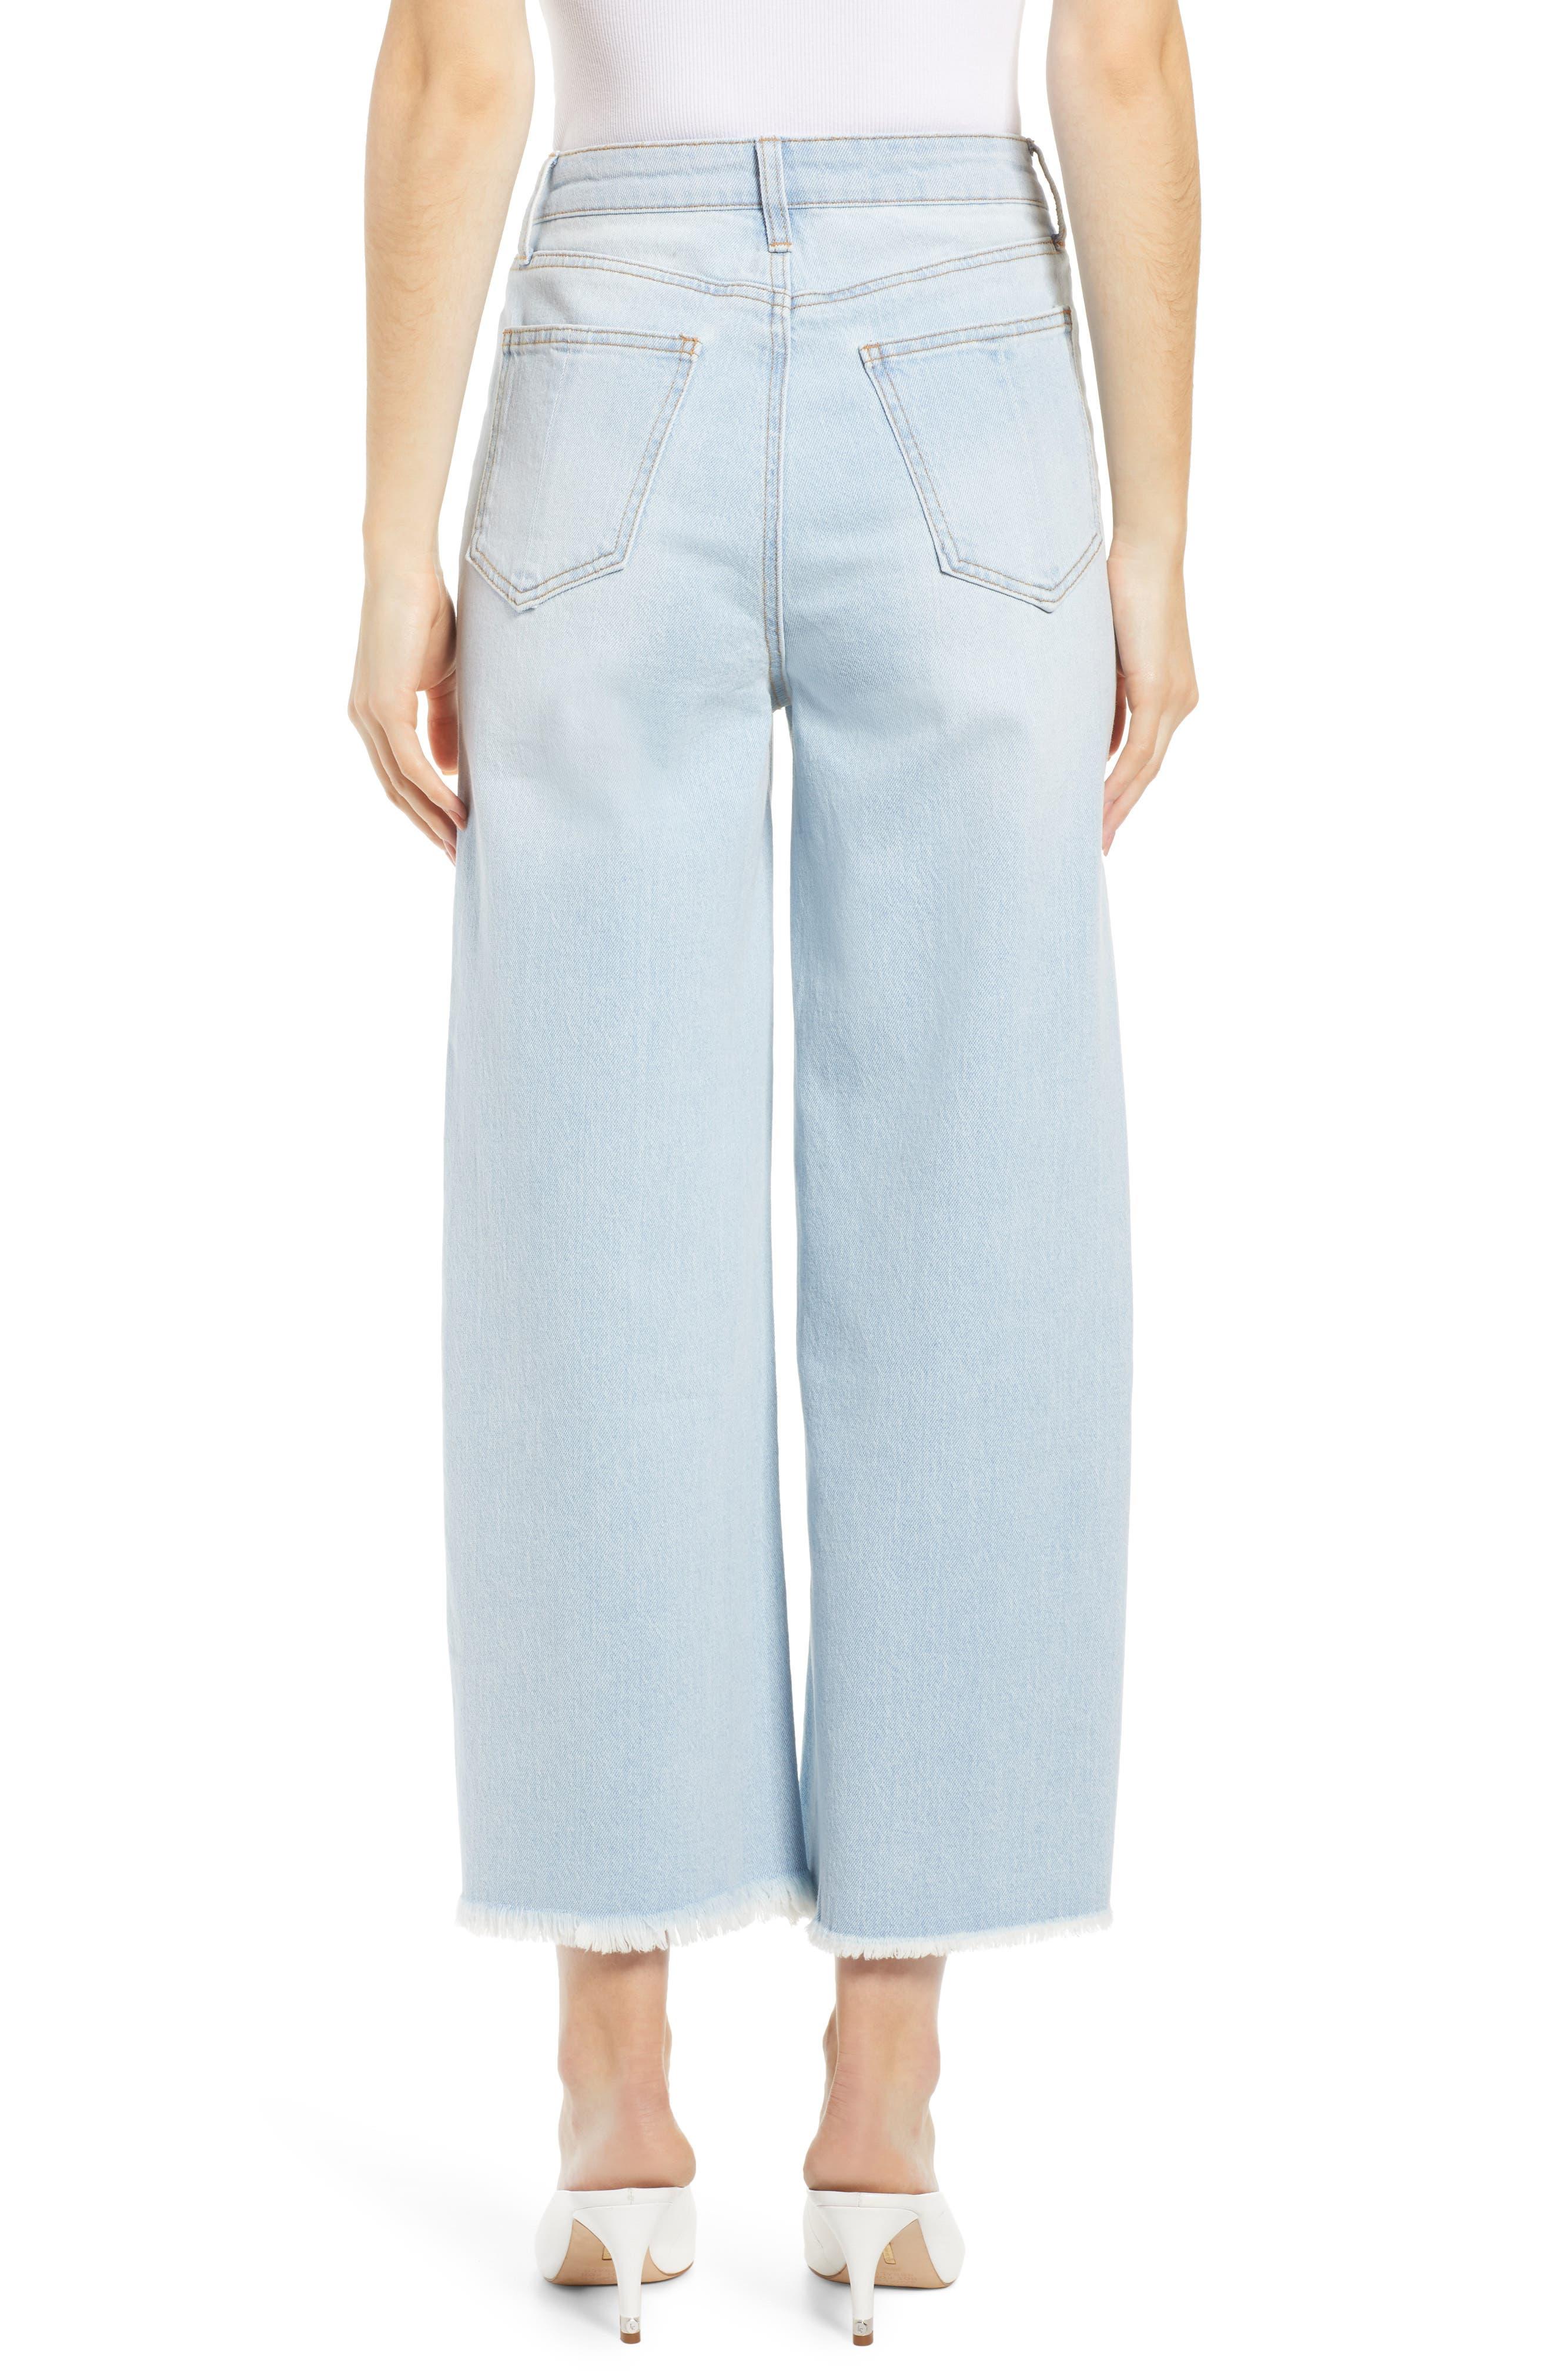 PROSPERITY DENIM, Fray Hem Wide Leg Crop Jeans, Alternate thumbnail 2, color, LIGHT WASH